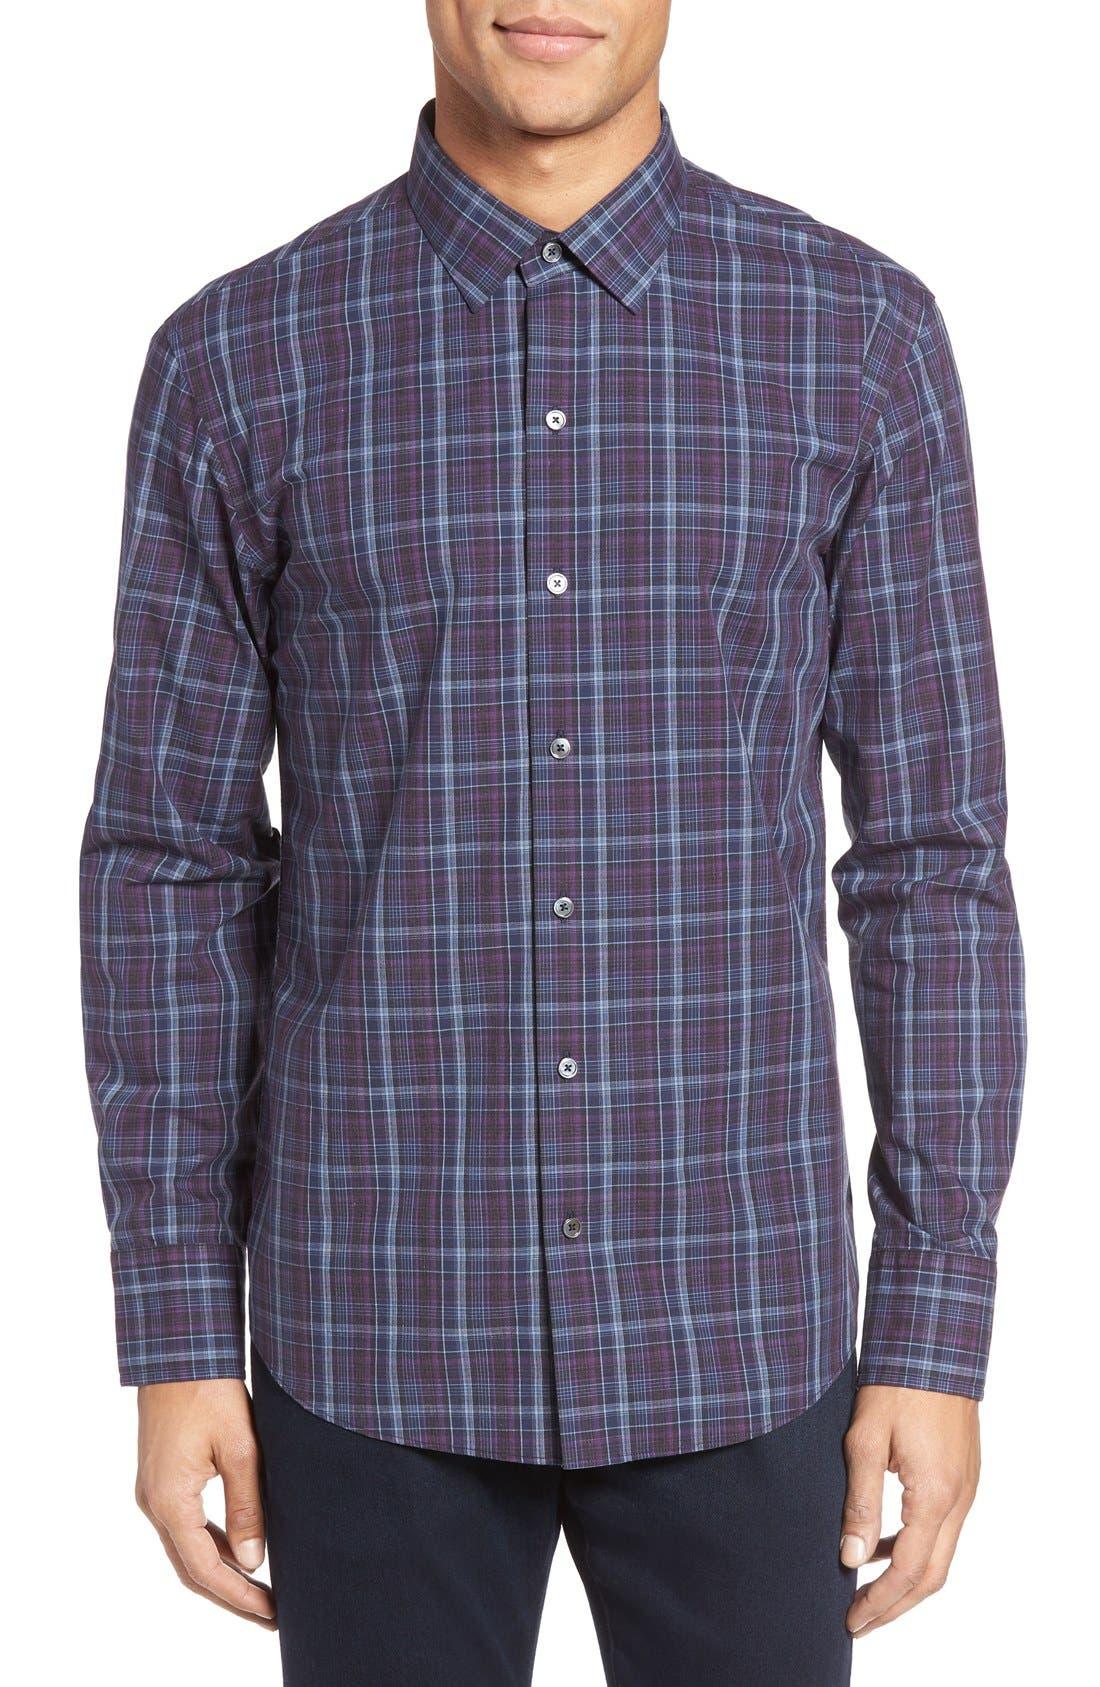 Alternate Image 1 Selected - Zachary Prell Bulatao Trim Fit Plaid Sport Shirt